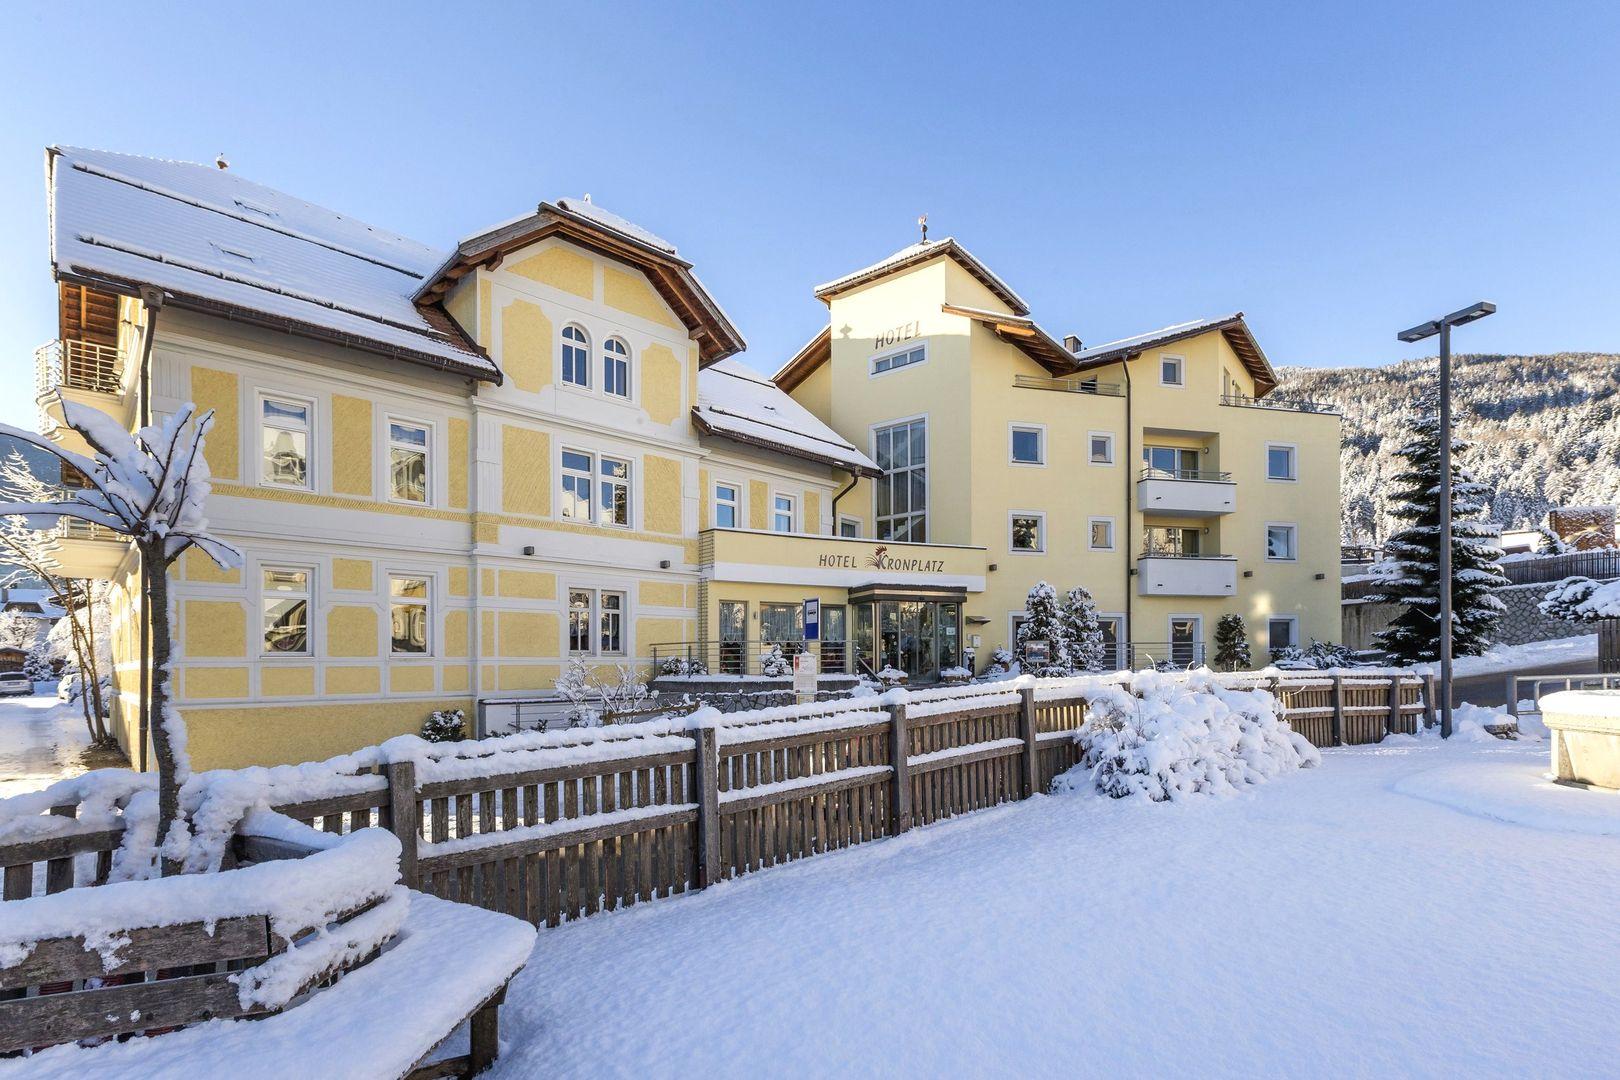 hotel kronplatz - mountain living